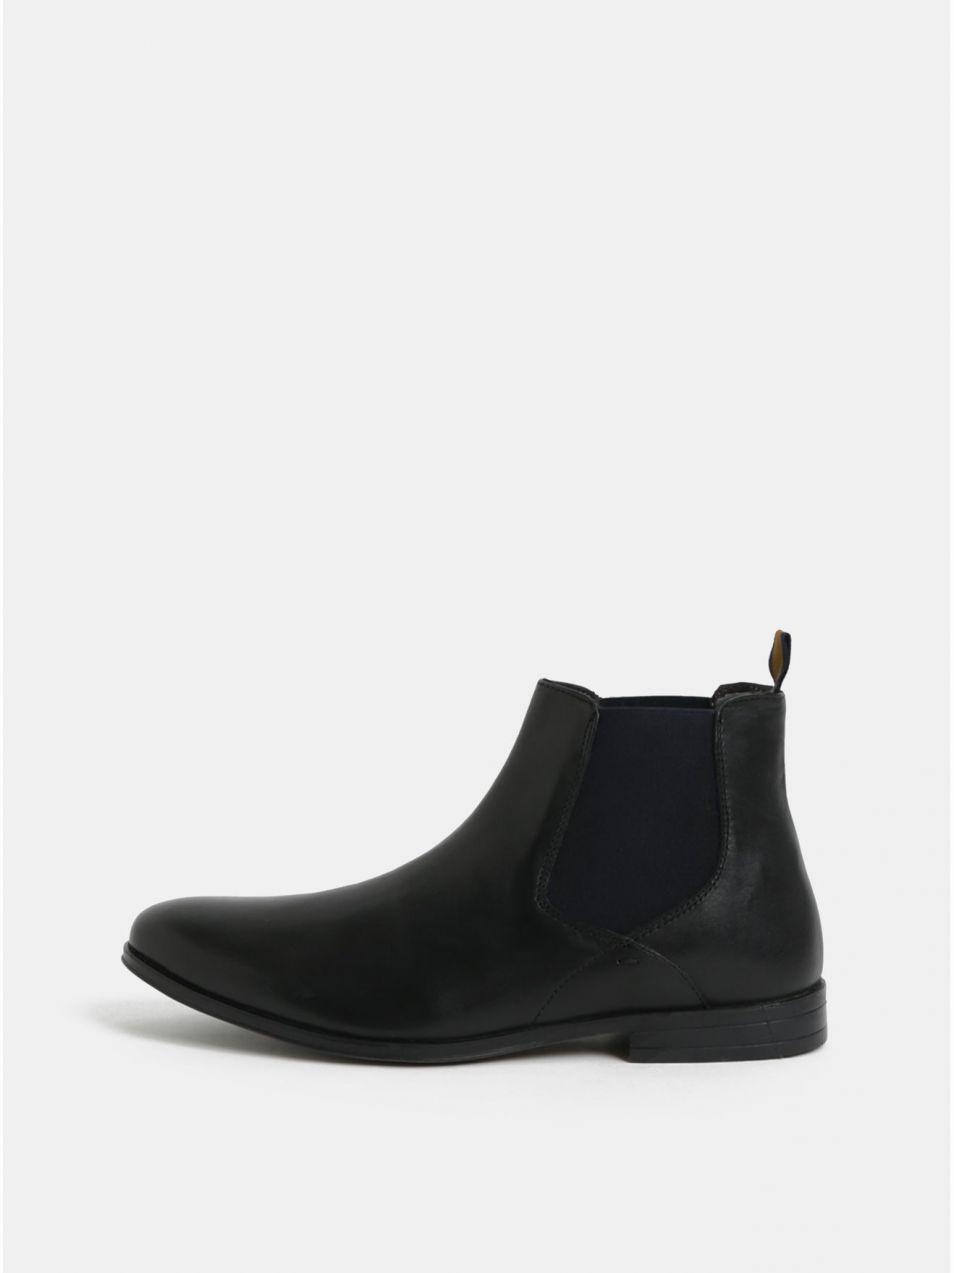 64fa1d7b4 Čierne pánske kožené chelsea topánky Burton Menswear London Rafferty značky Burton  Menswear London - Lovely.sk